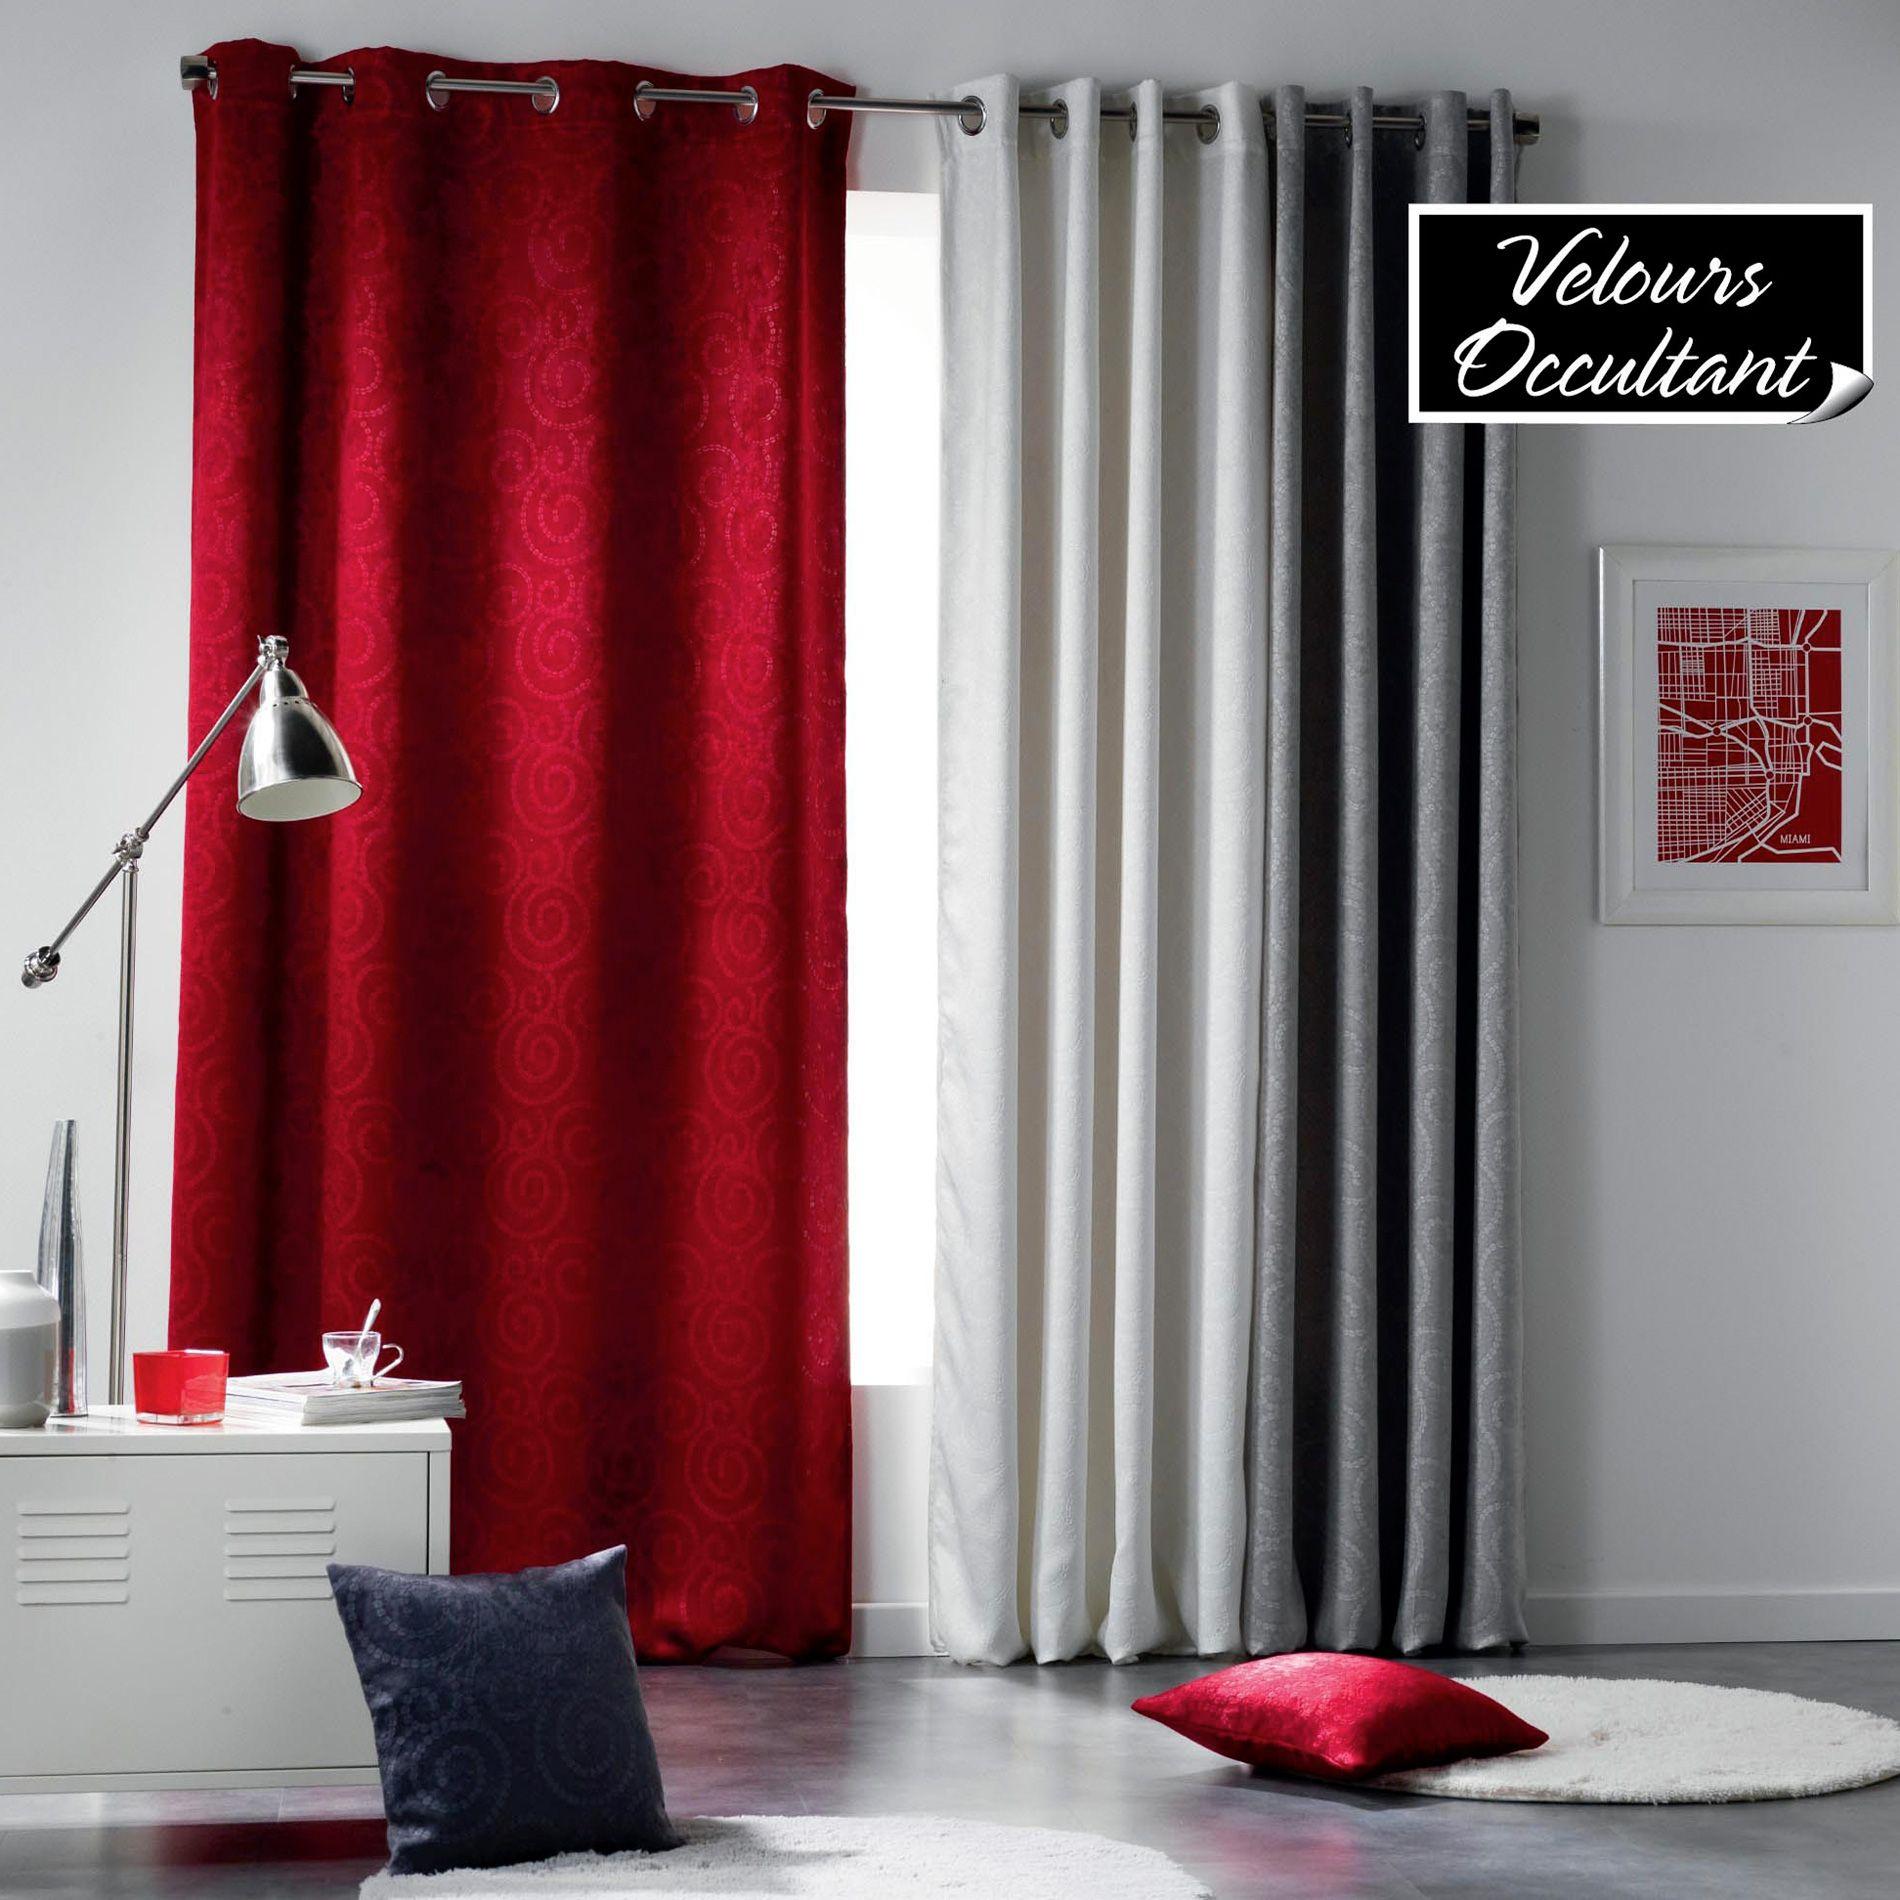 rideau occultant 140 x 240 cm velours noctua rouge rideau occultant eminza. Black Bedroom Furniture Sets. Home Design Ideas